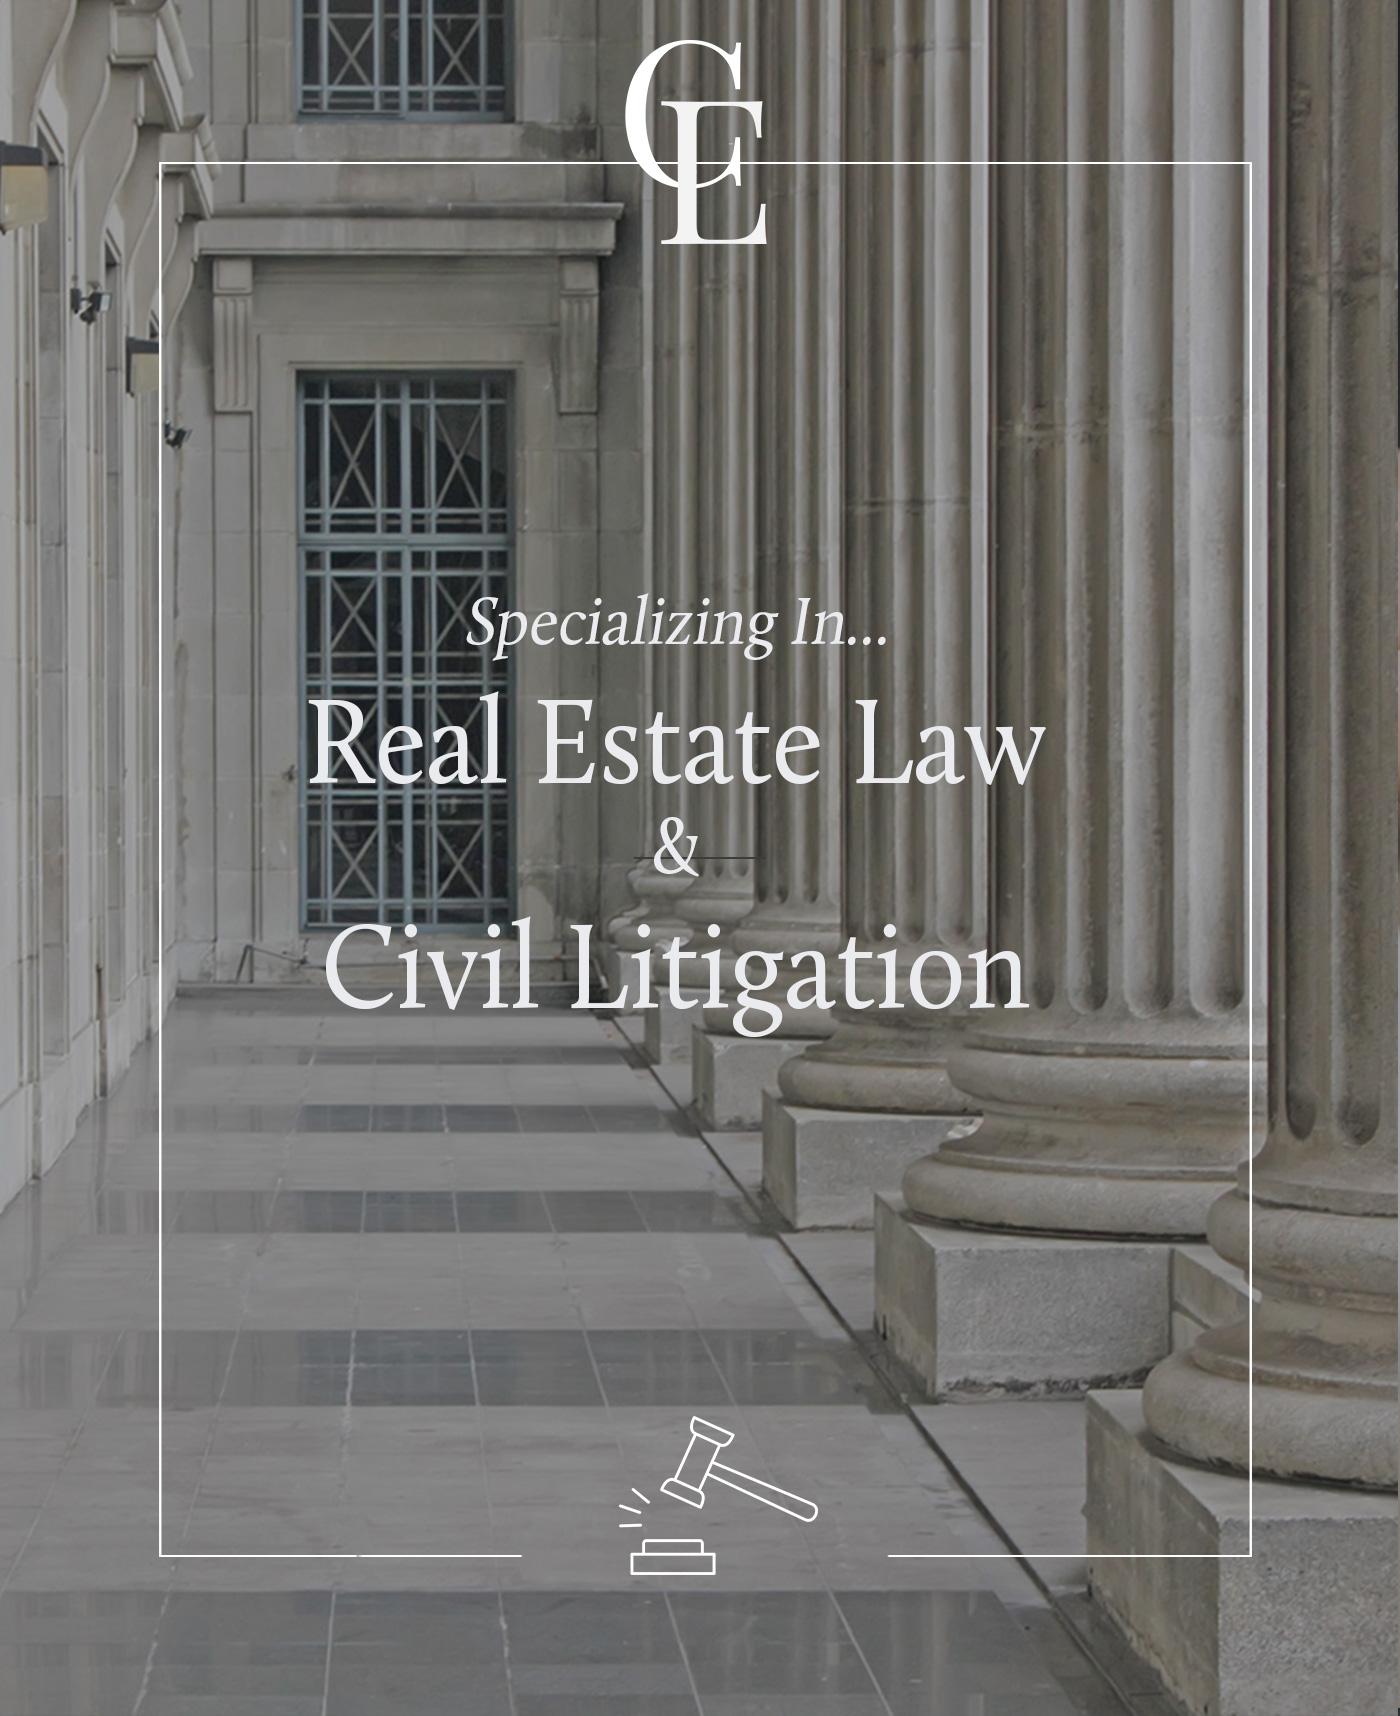 Real-Estate-Attorney-3.jpg